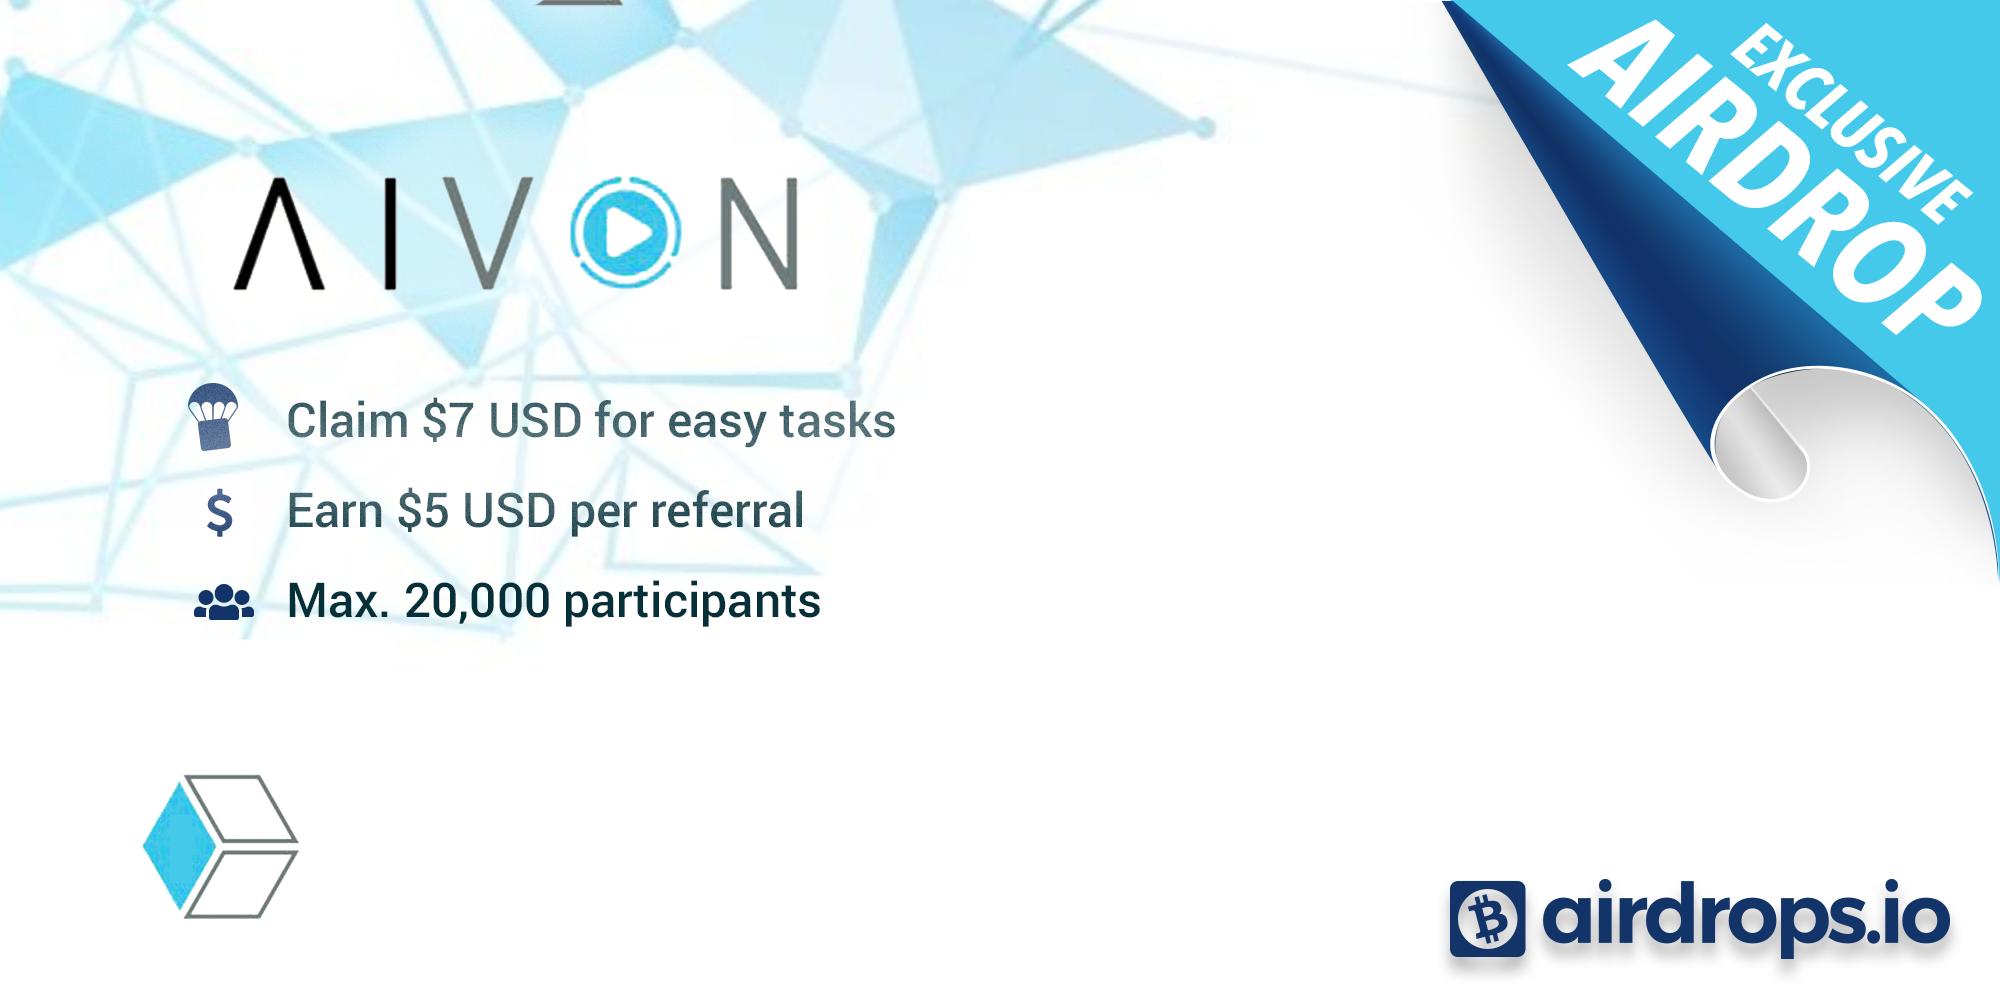 AIVON Airdrop » Claim 44 free AVO tokens (~ $7 + $5 per ref)